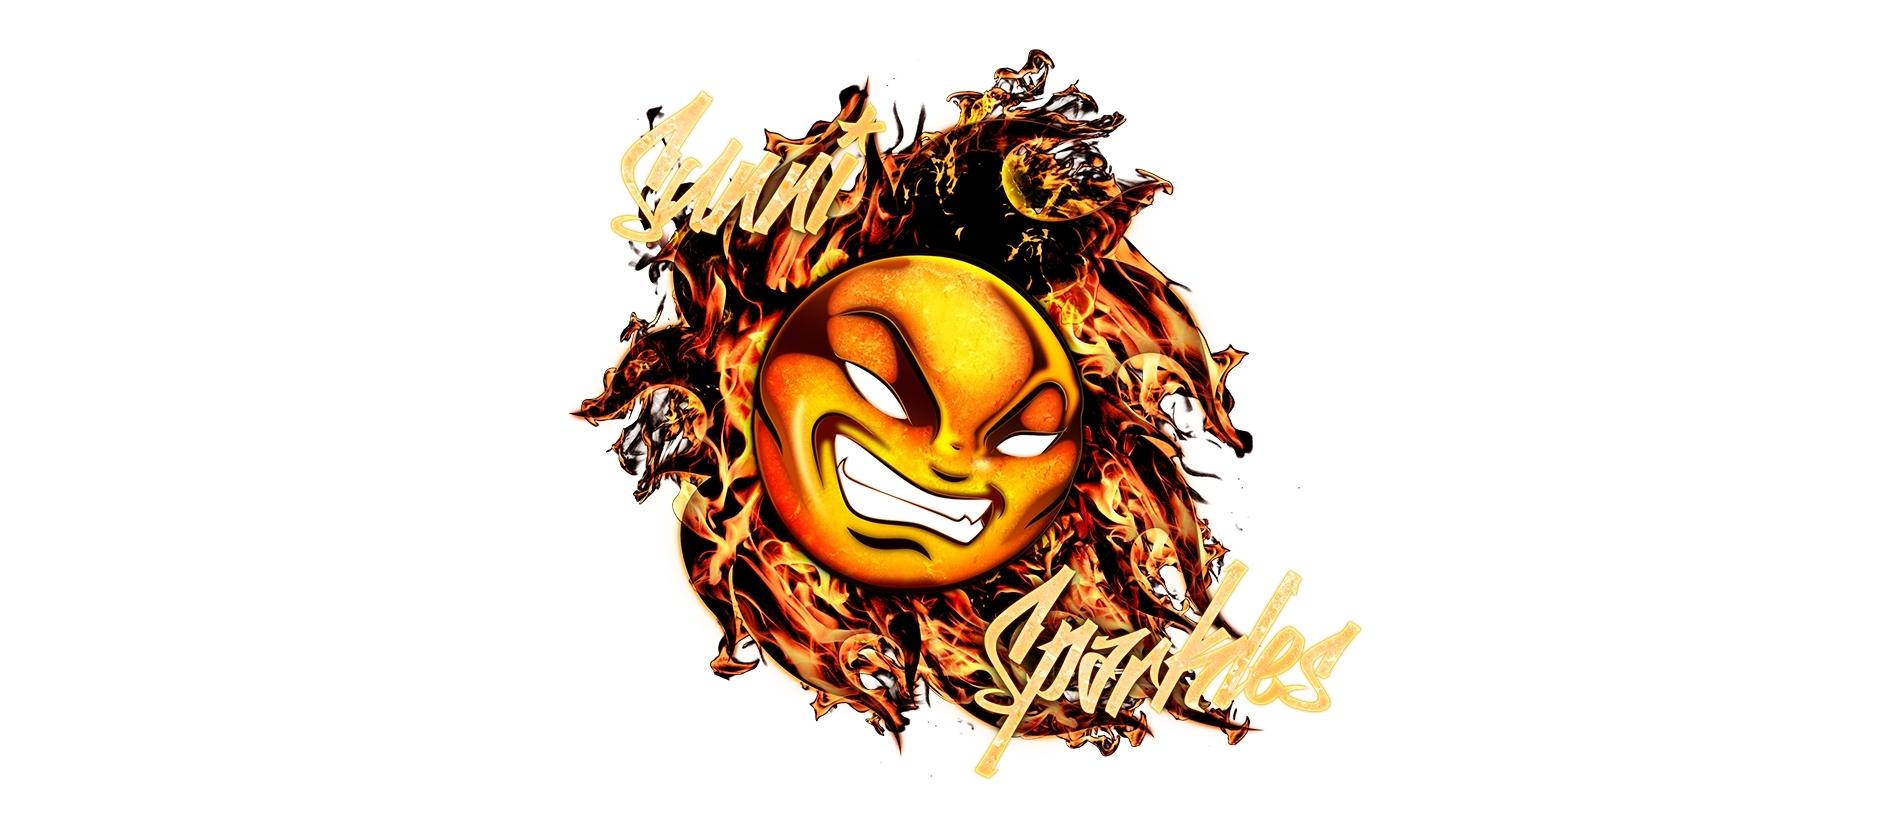 Sunni Sparkles Logo